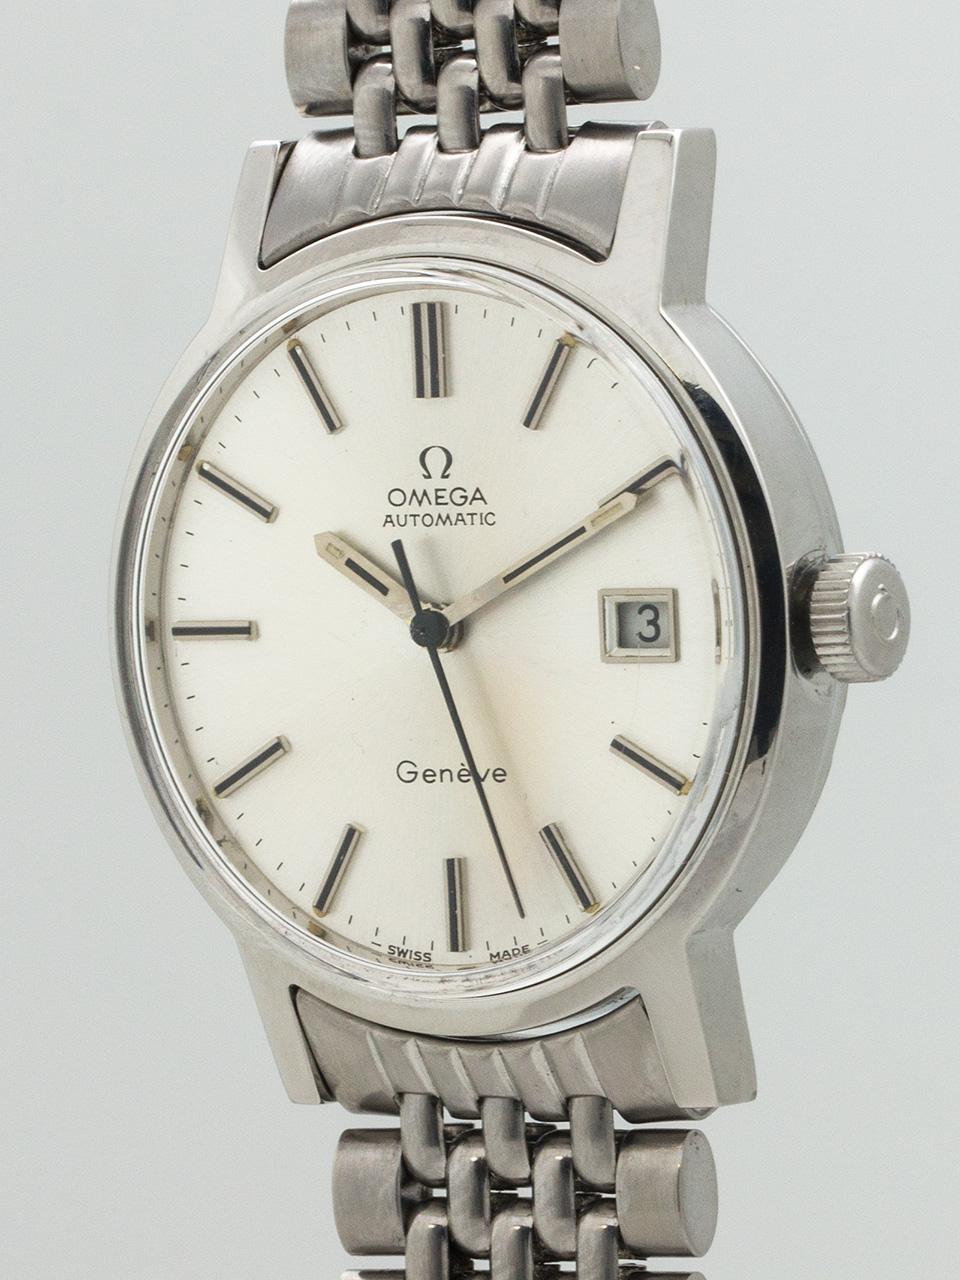 Omega Automatic Geneve circa 1970's Rice Bracelet